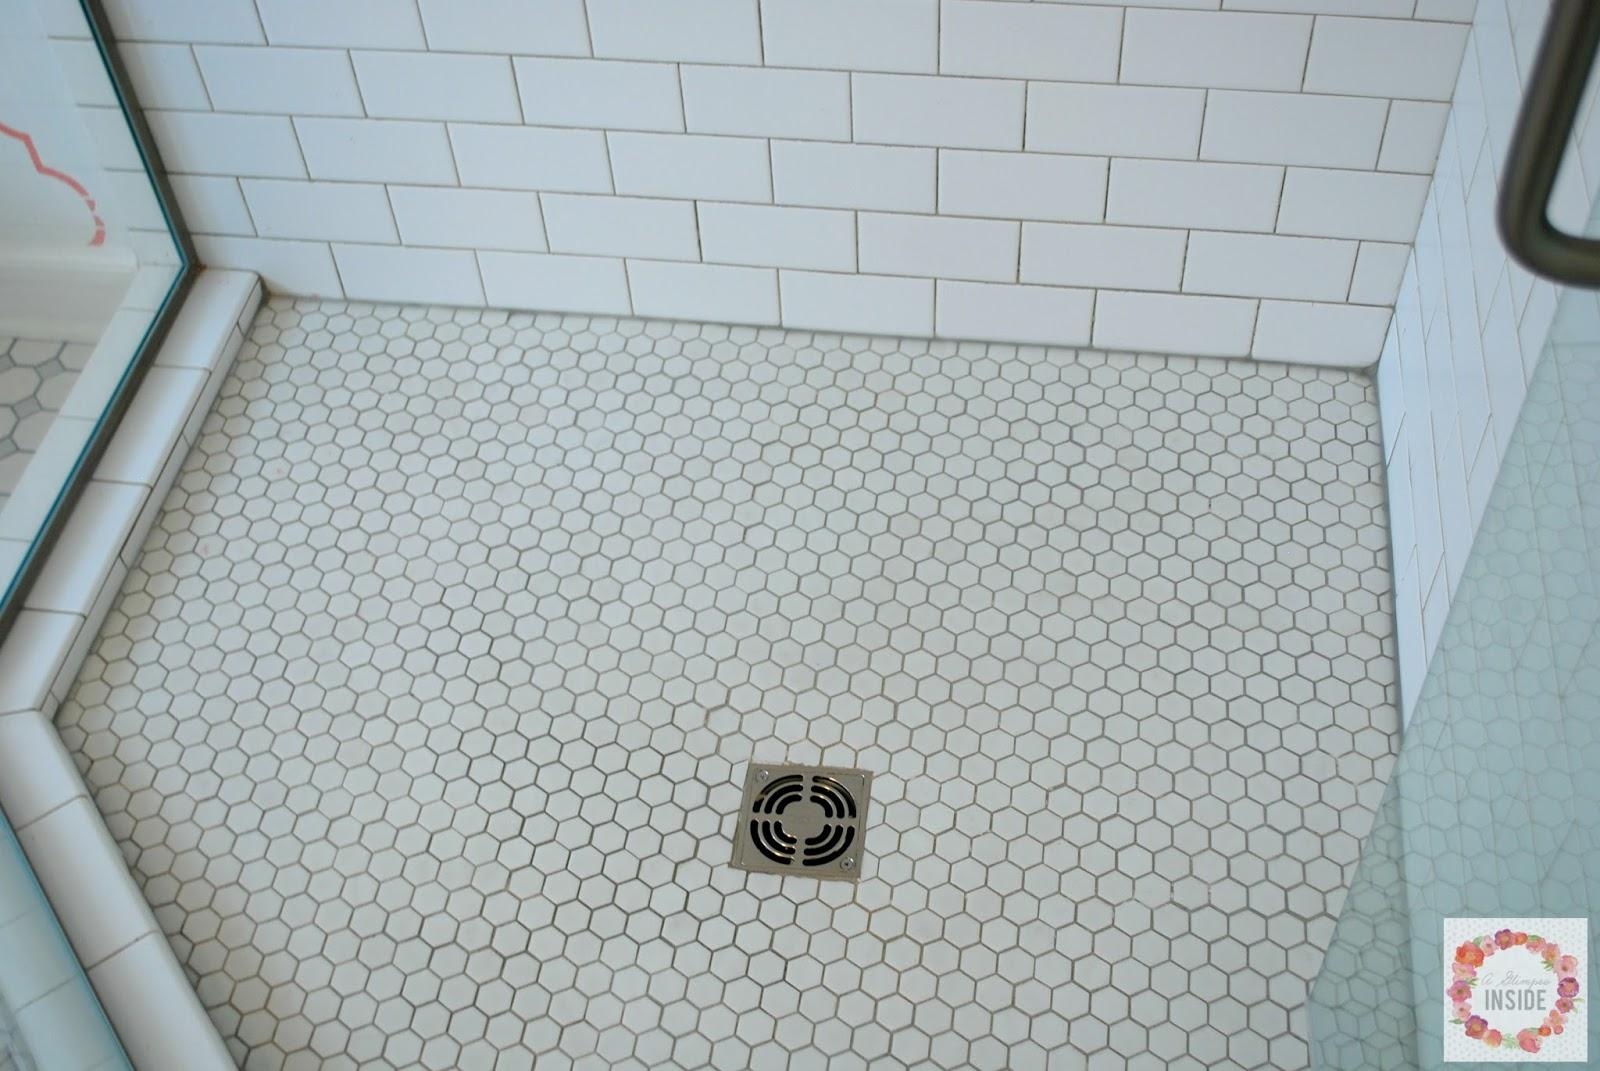 Master Bathroom Reveal | A Glimpse Inside